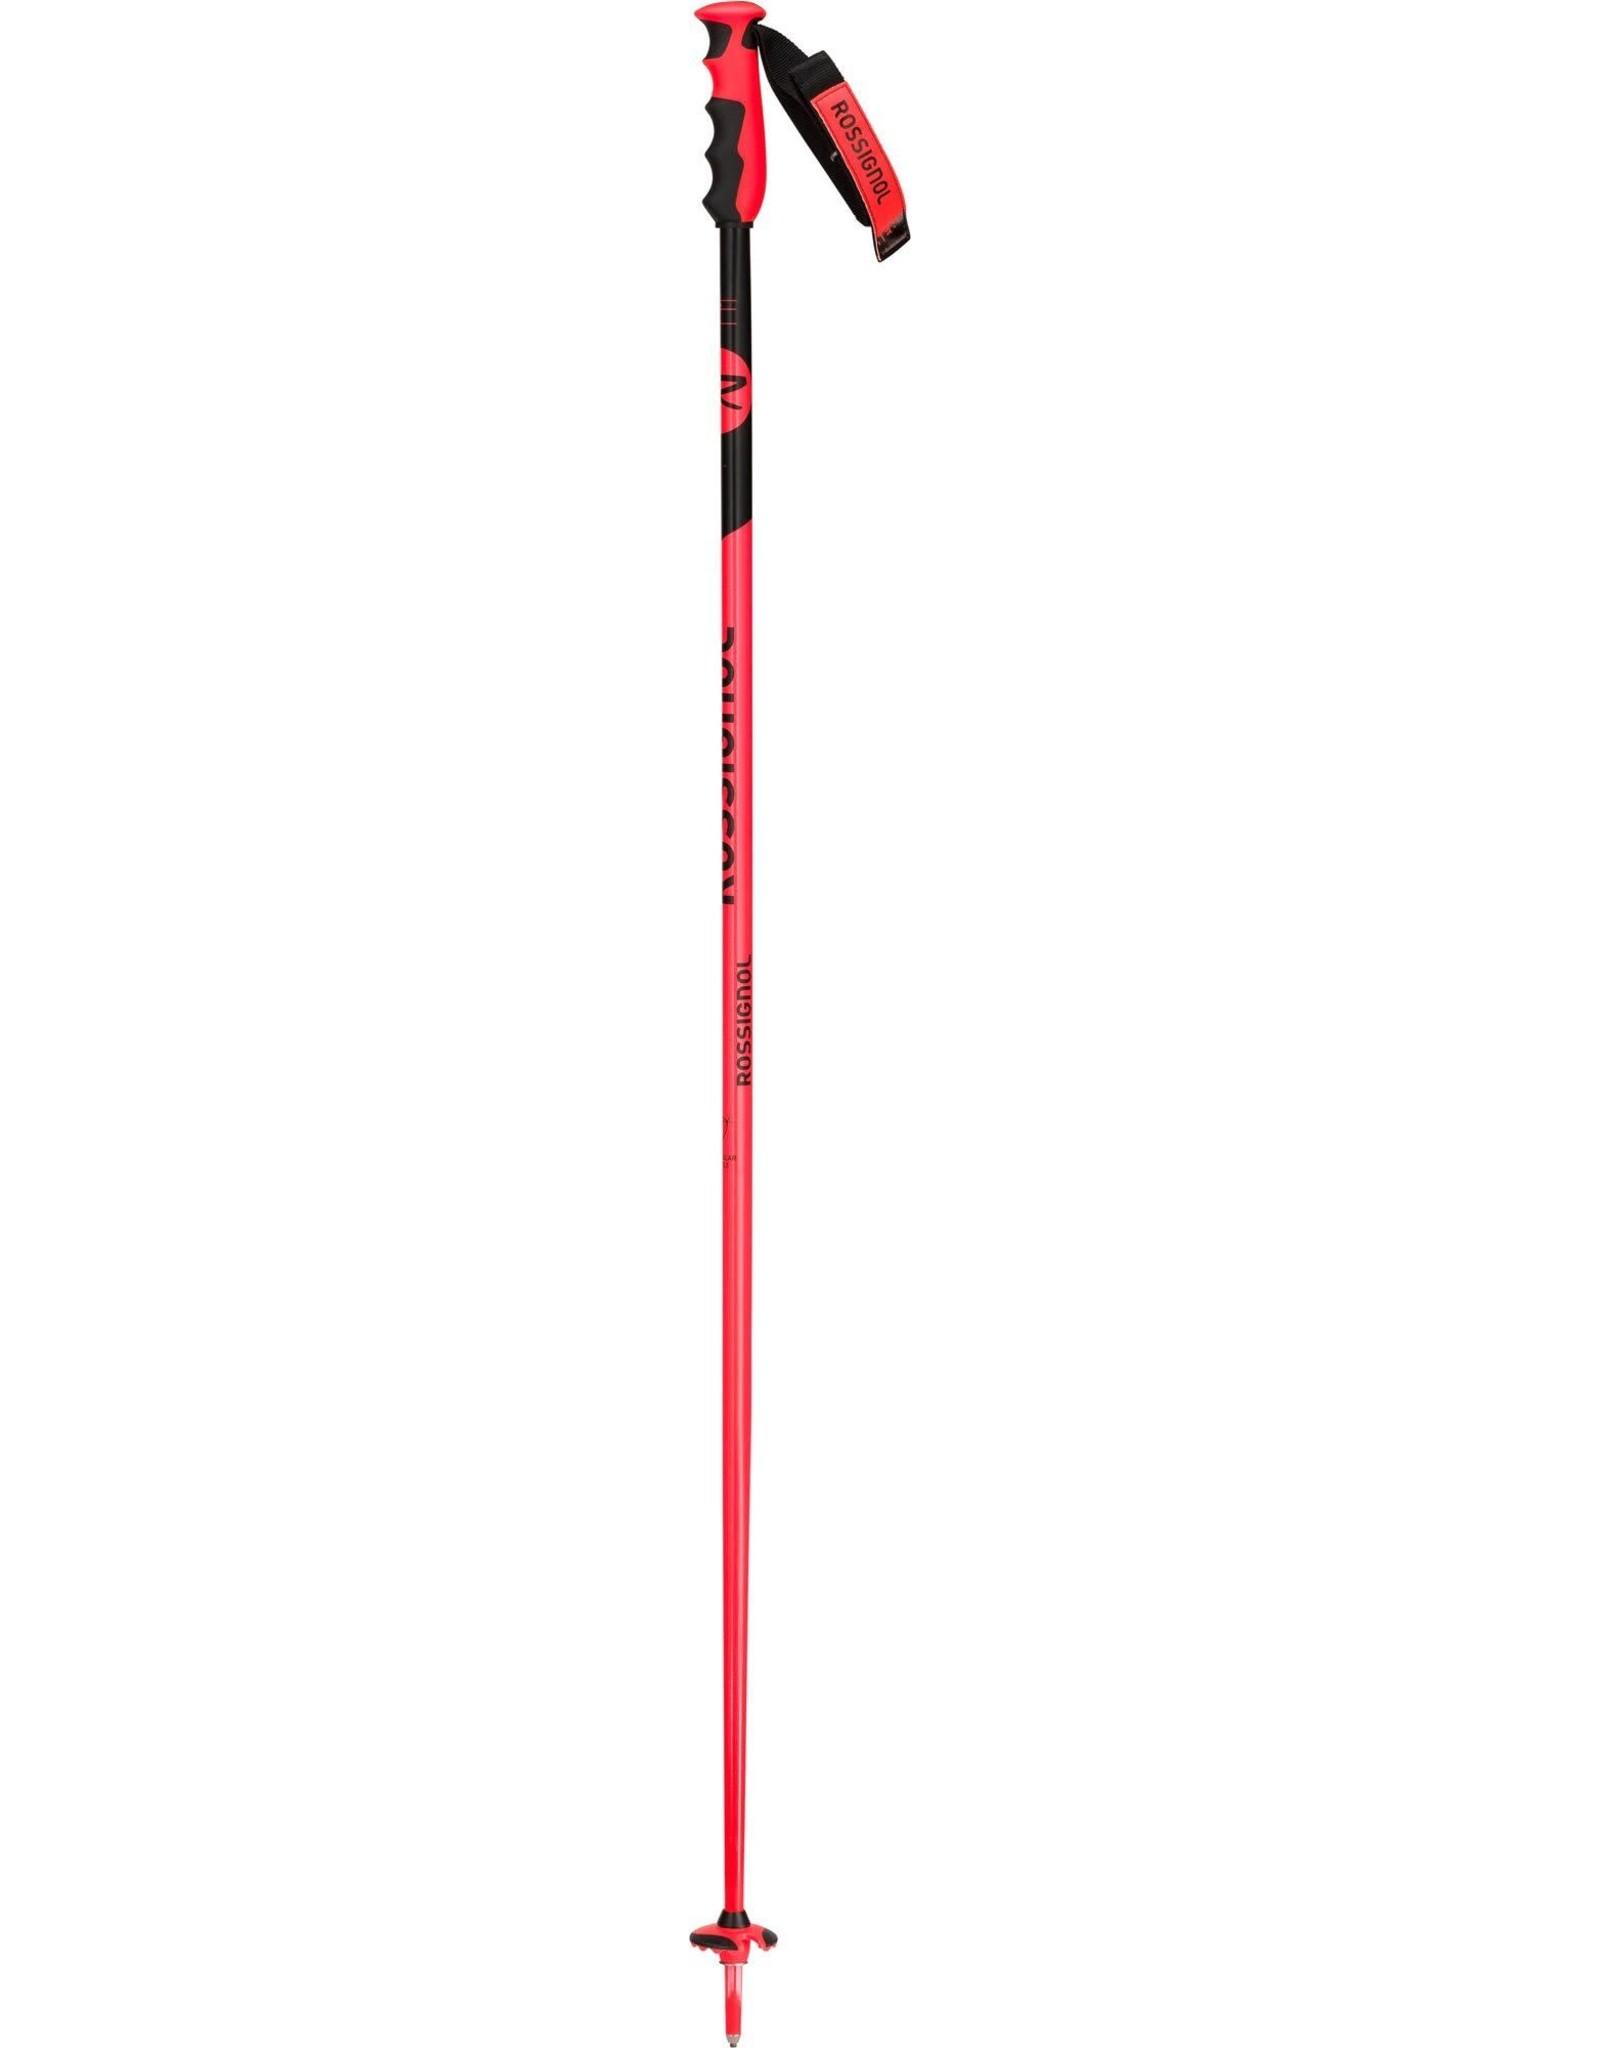 ROSSIGNOL ROSSIGNOL HERO SL alpine ski pole 22